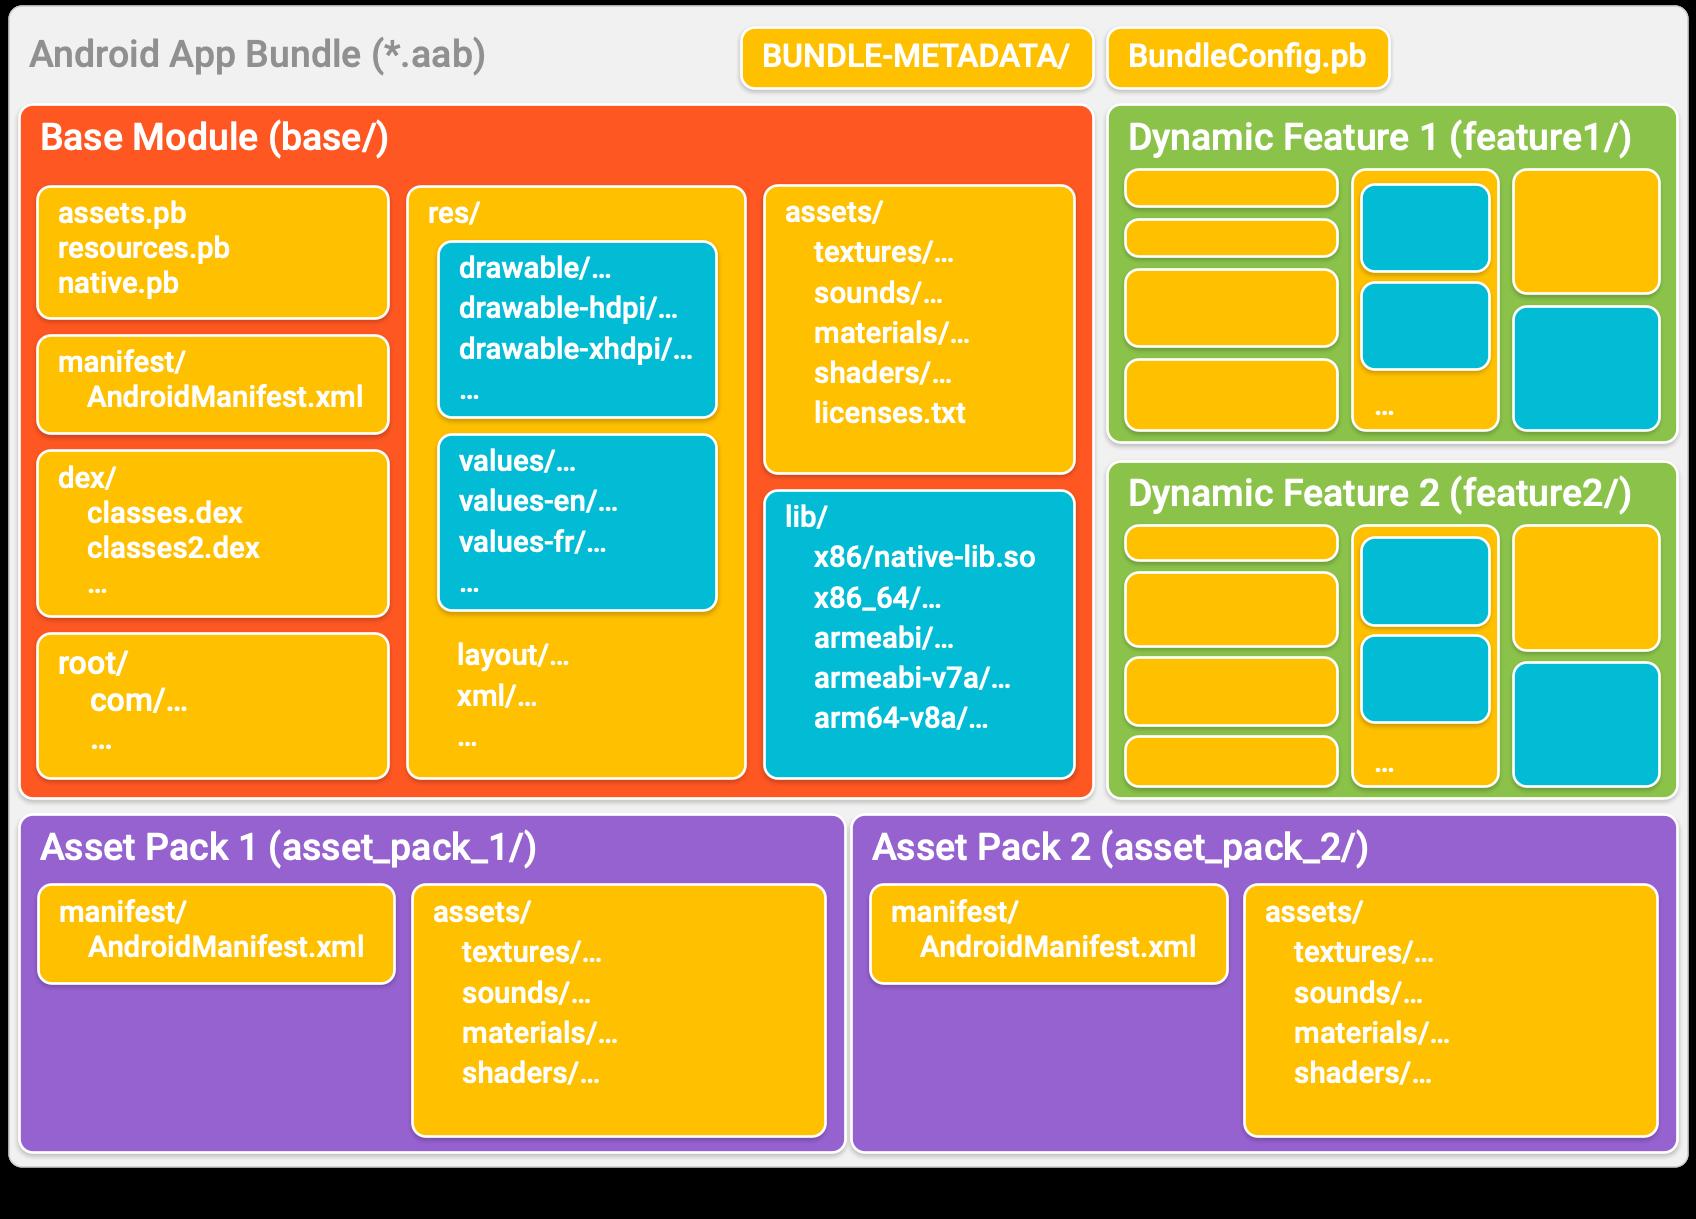 app bundle 会将您的应用组织到目录中,每个目录表示一个模块。在每个模块目录中,代码和资源的组织方式与典型的 APK 类似。